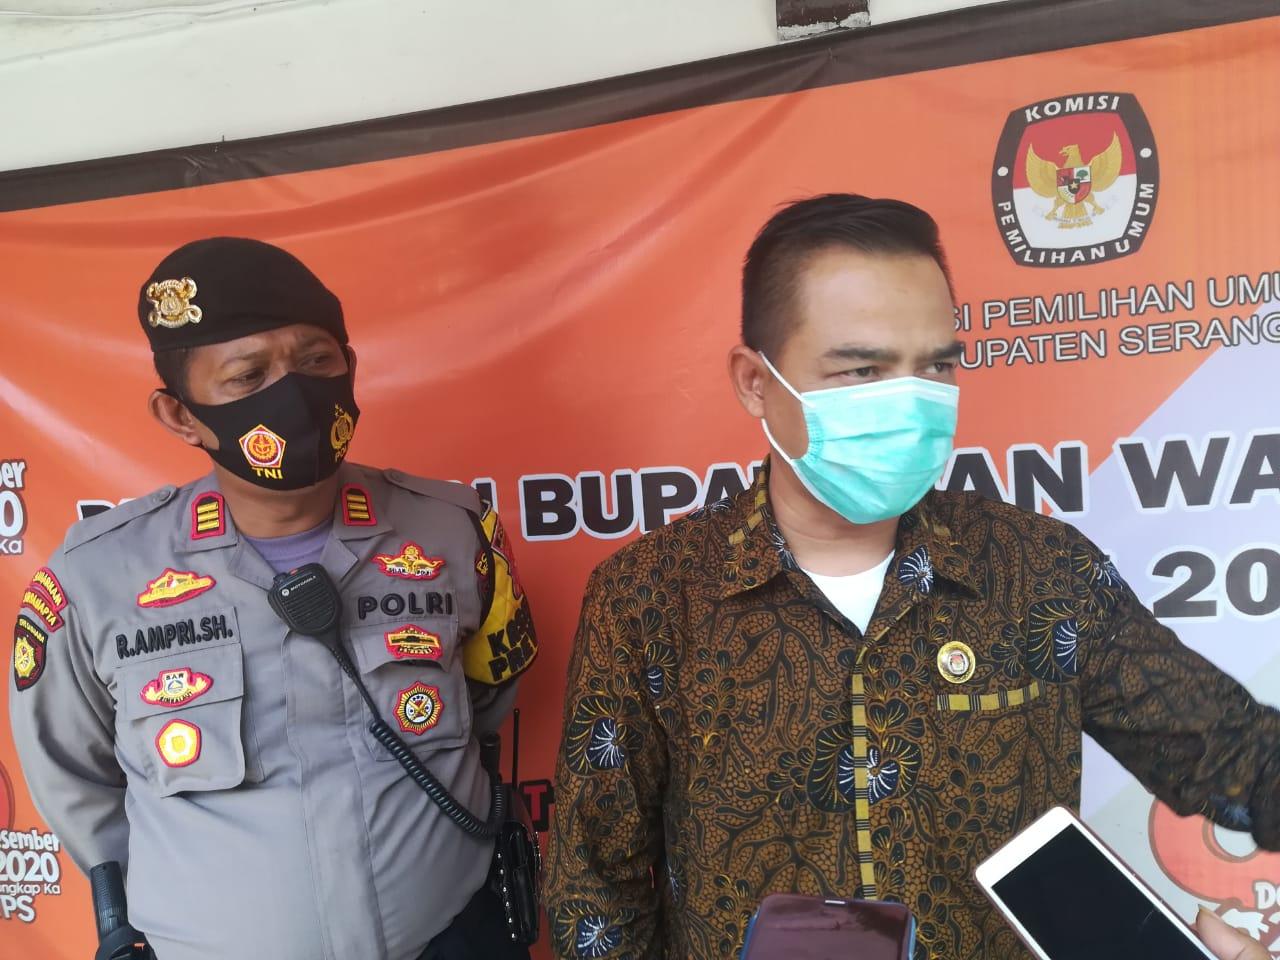 Tatu-Pandji dan Nasrul-Eki Sah Jadi Pasangan Calon pada Pilkada Kabupaten Serang 2020